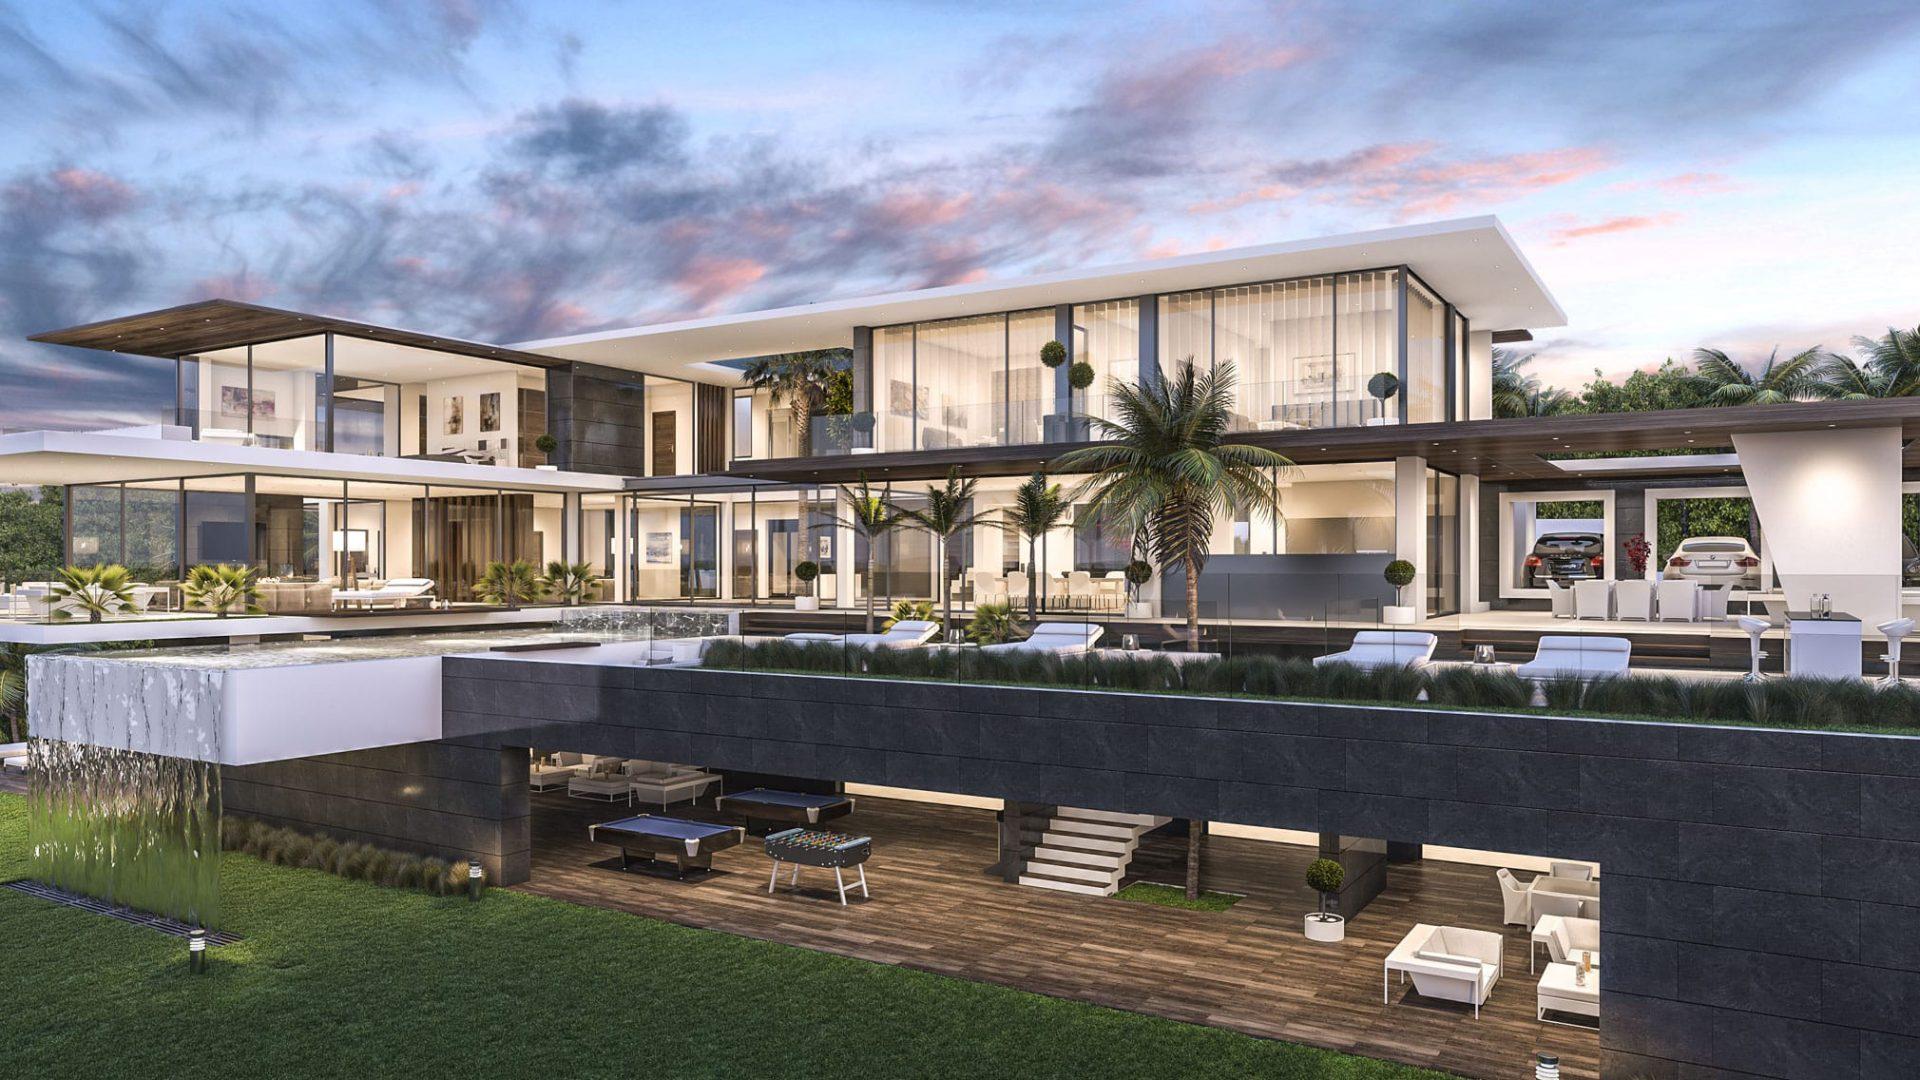 modern-luxury-villa-la-zagaleta-marbella-builders-architects-jubilo-01